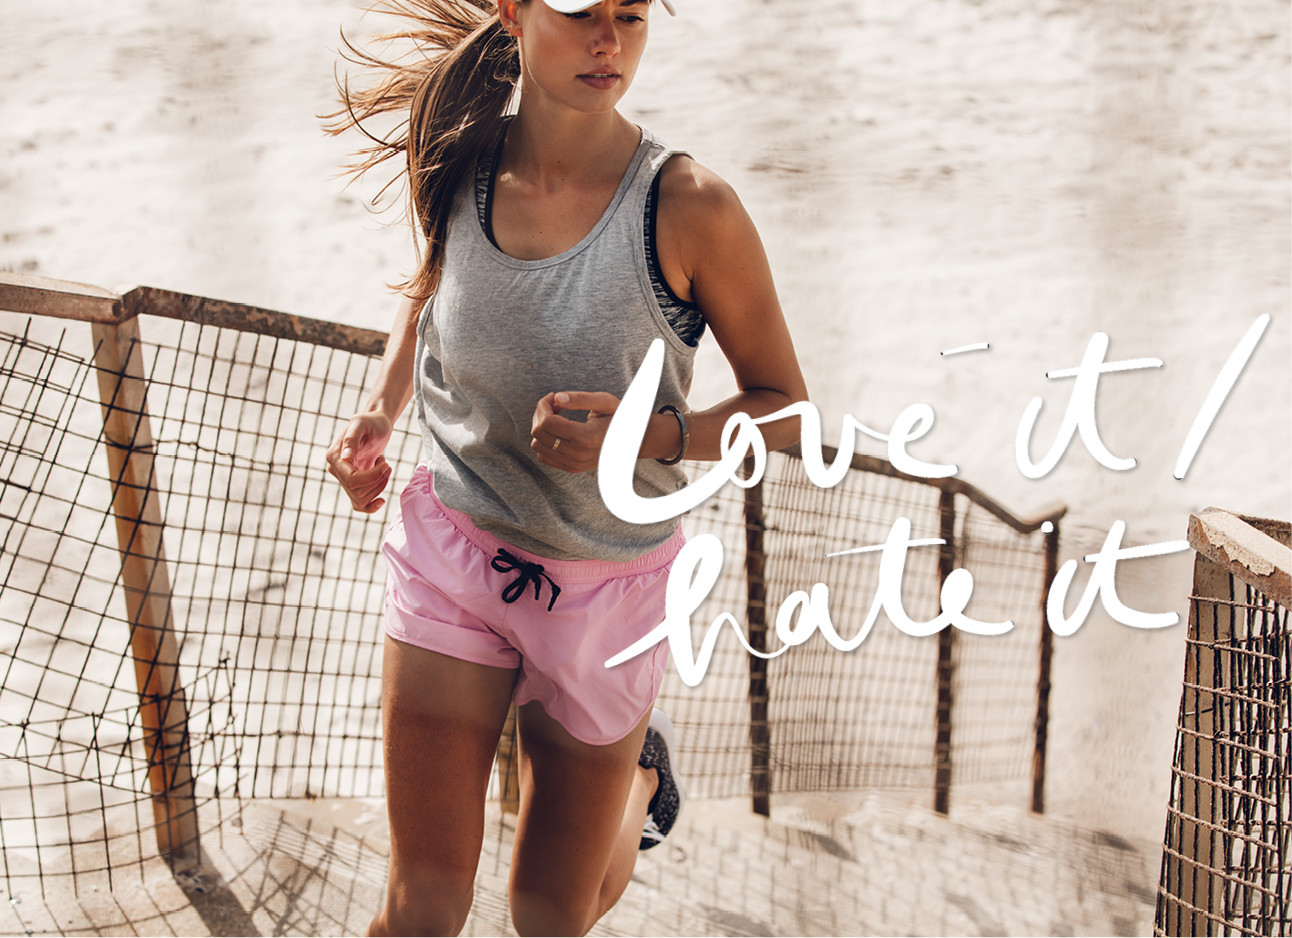 vrouw hardlopen op het strand